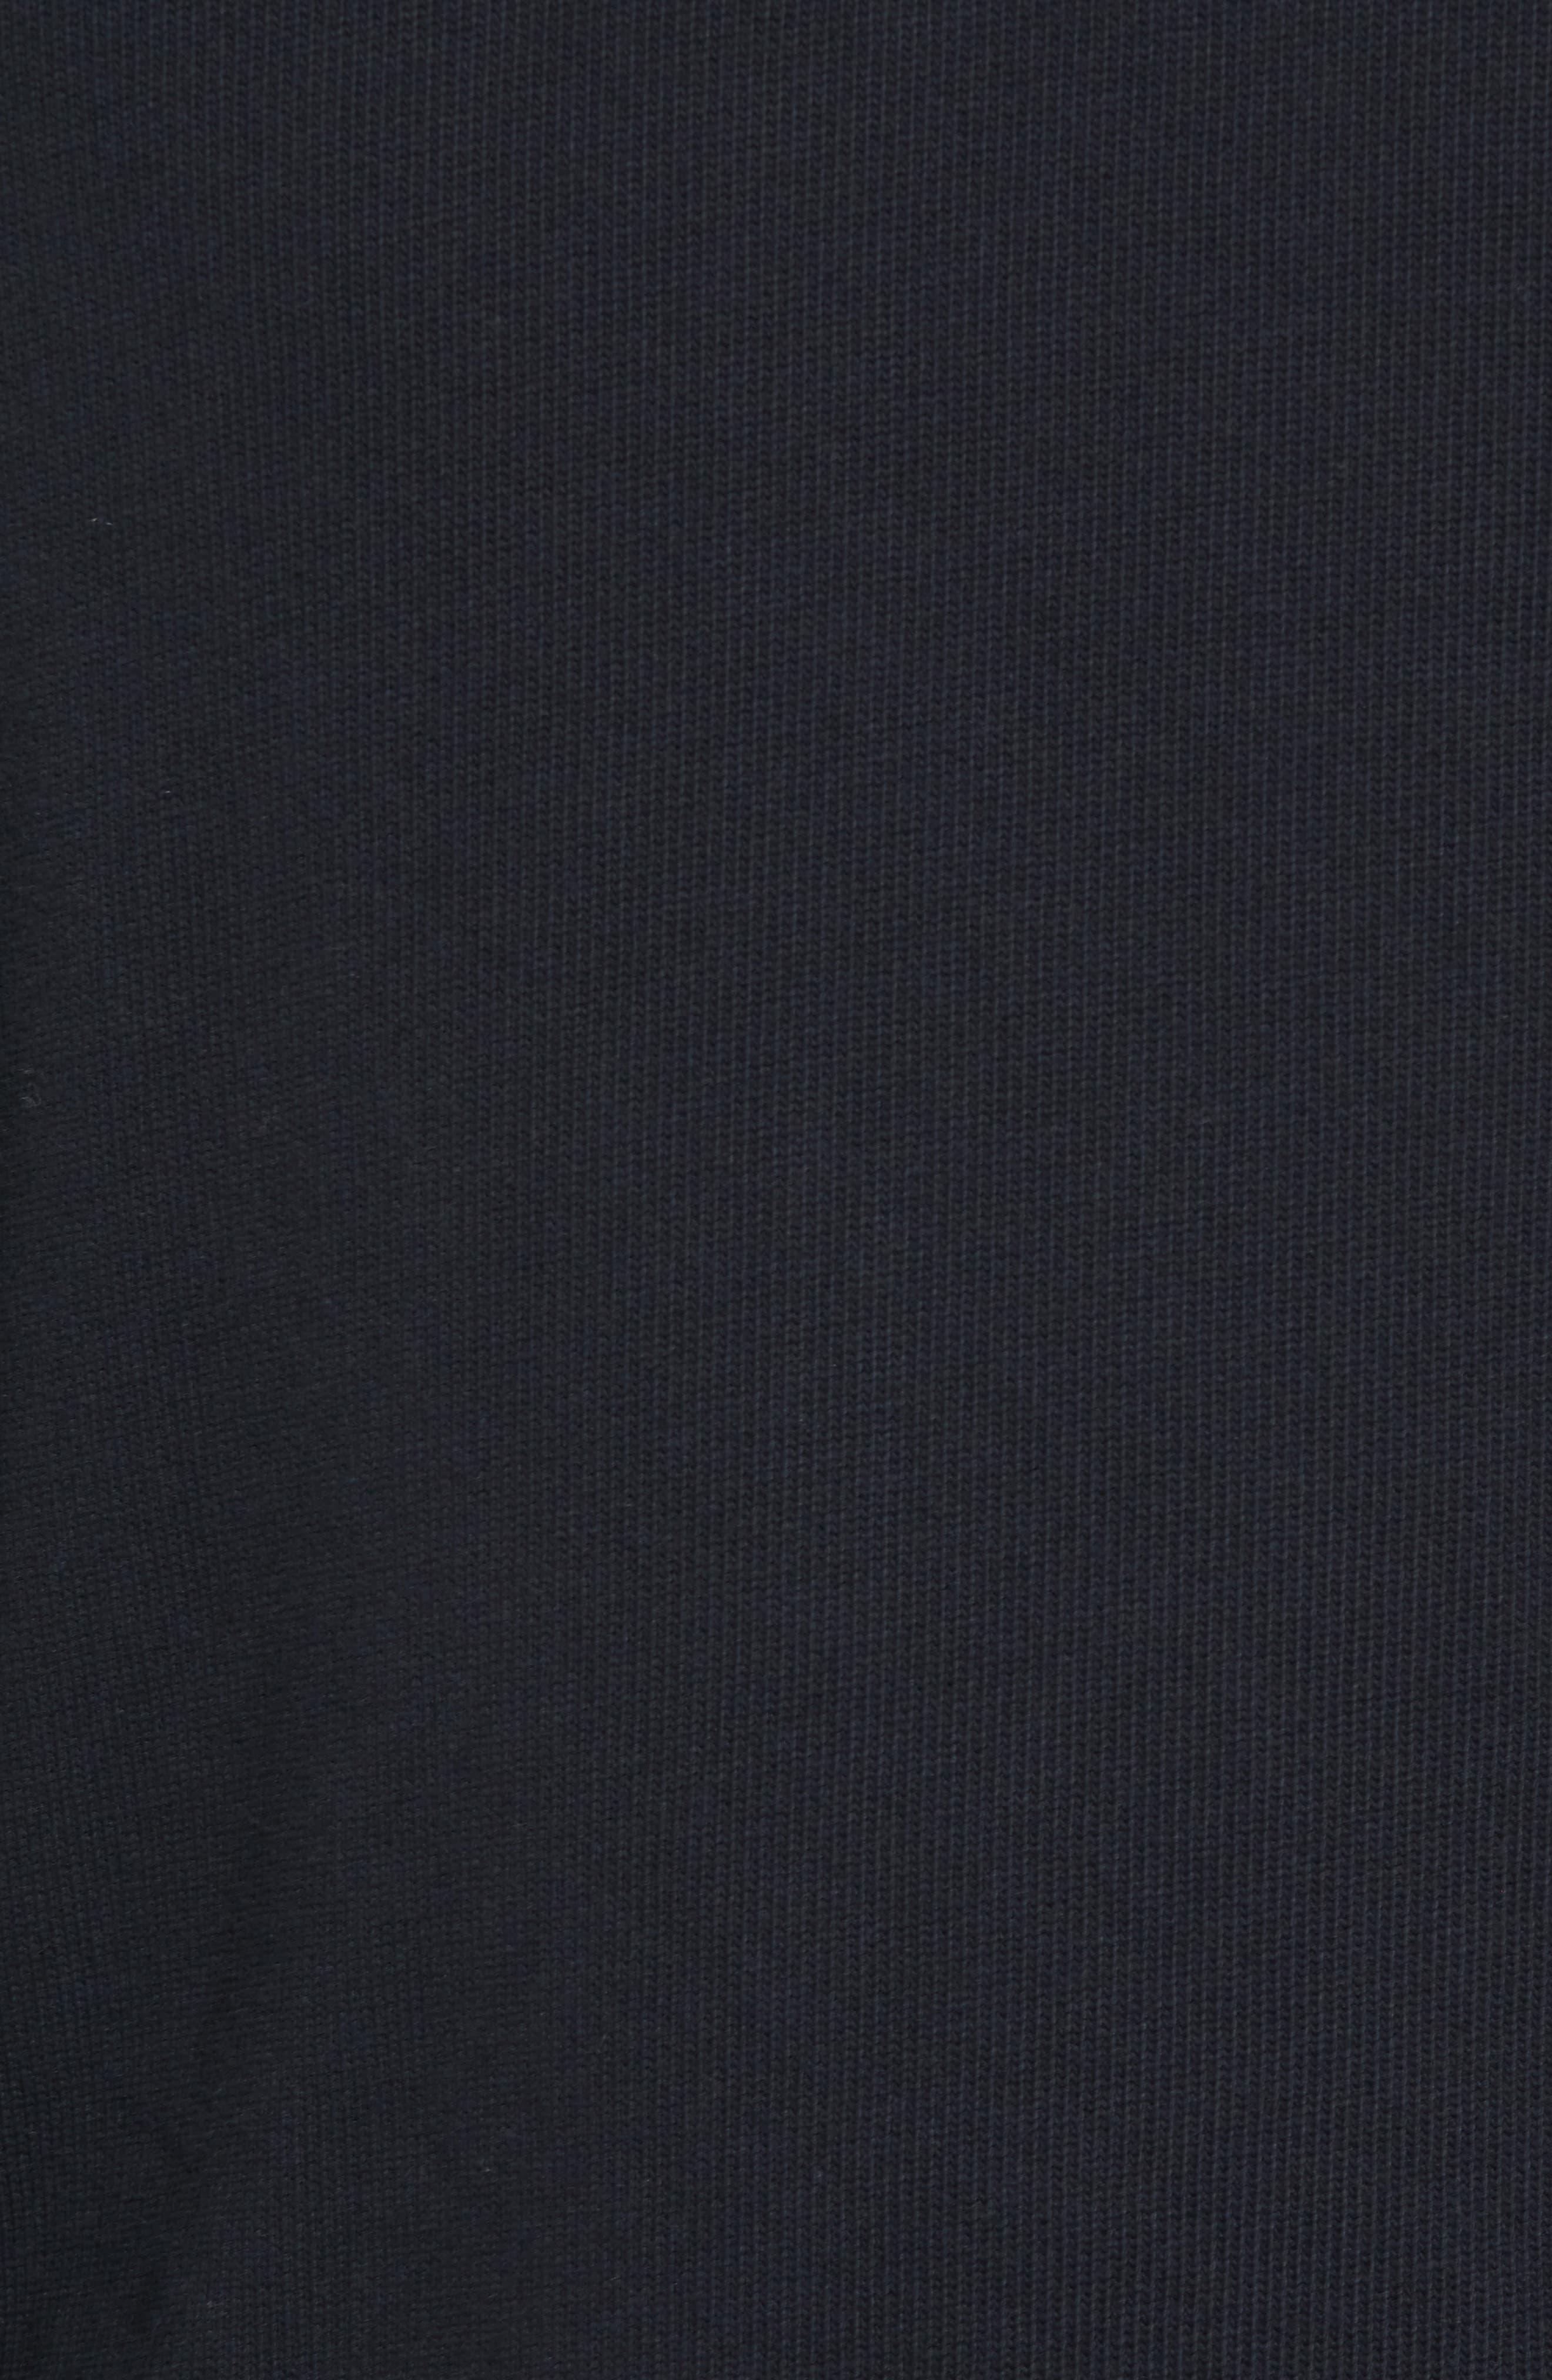 Crewneck Pullover,                             Alternate thumbnail 5, color,                             Black Rock